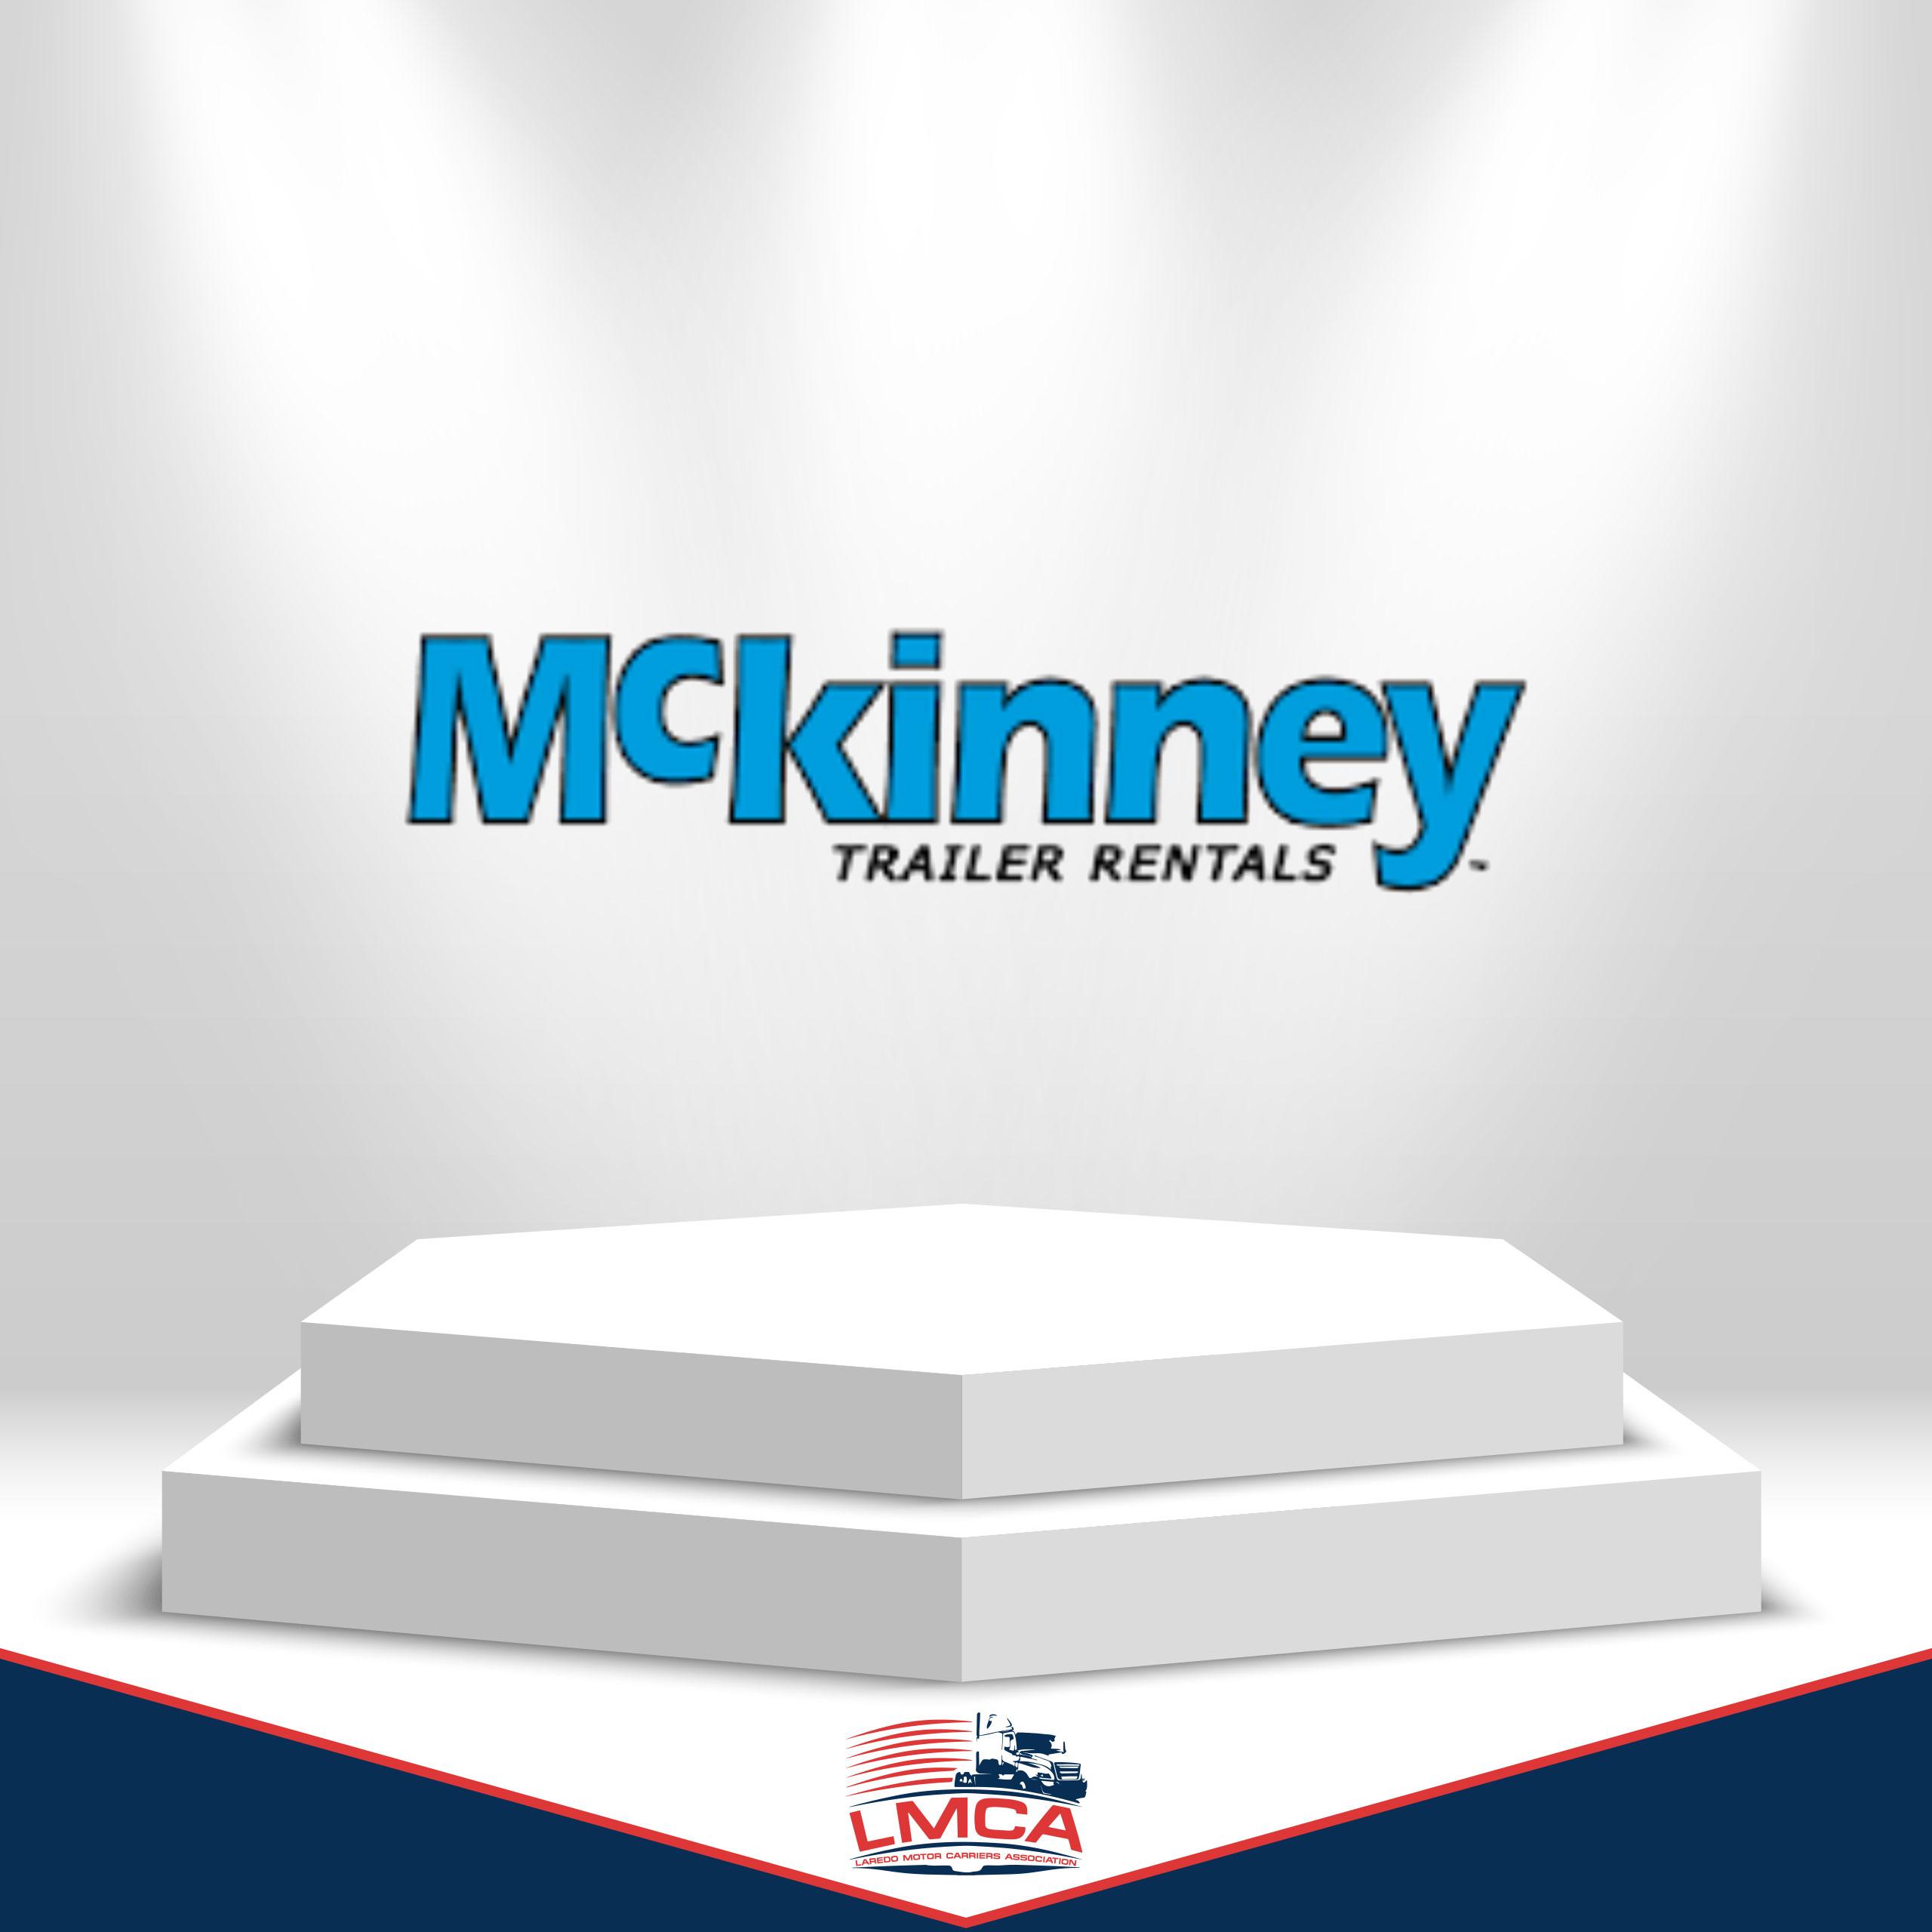 mckinney-lmca